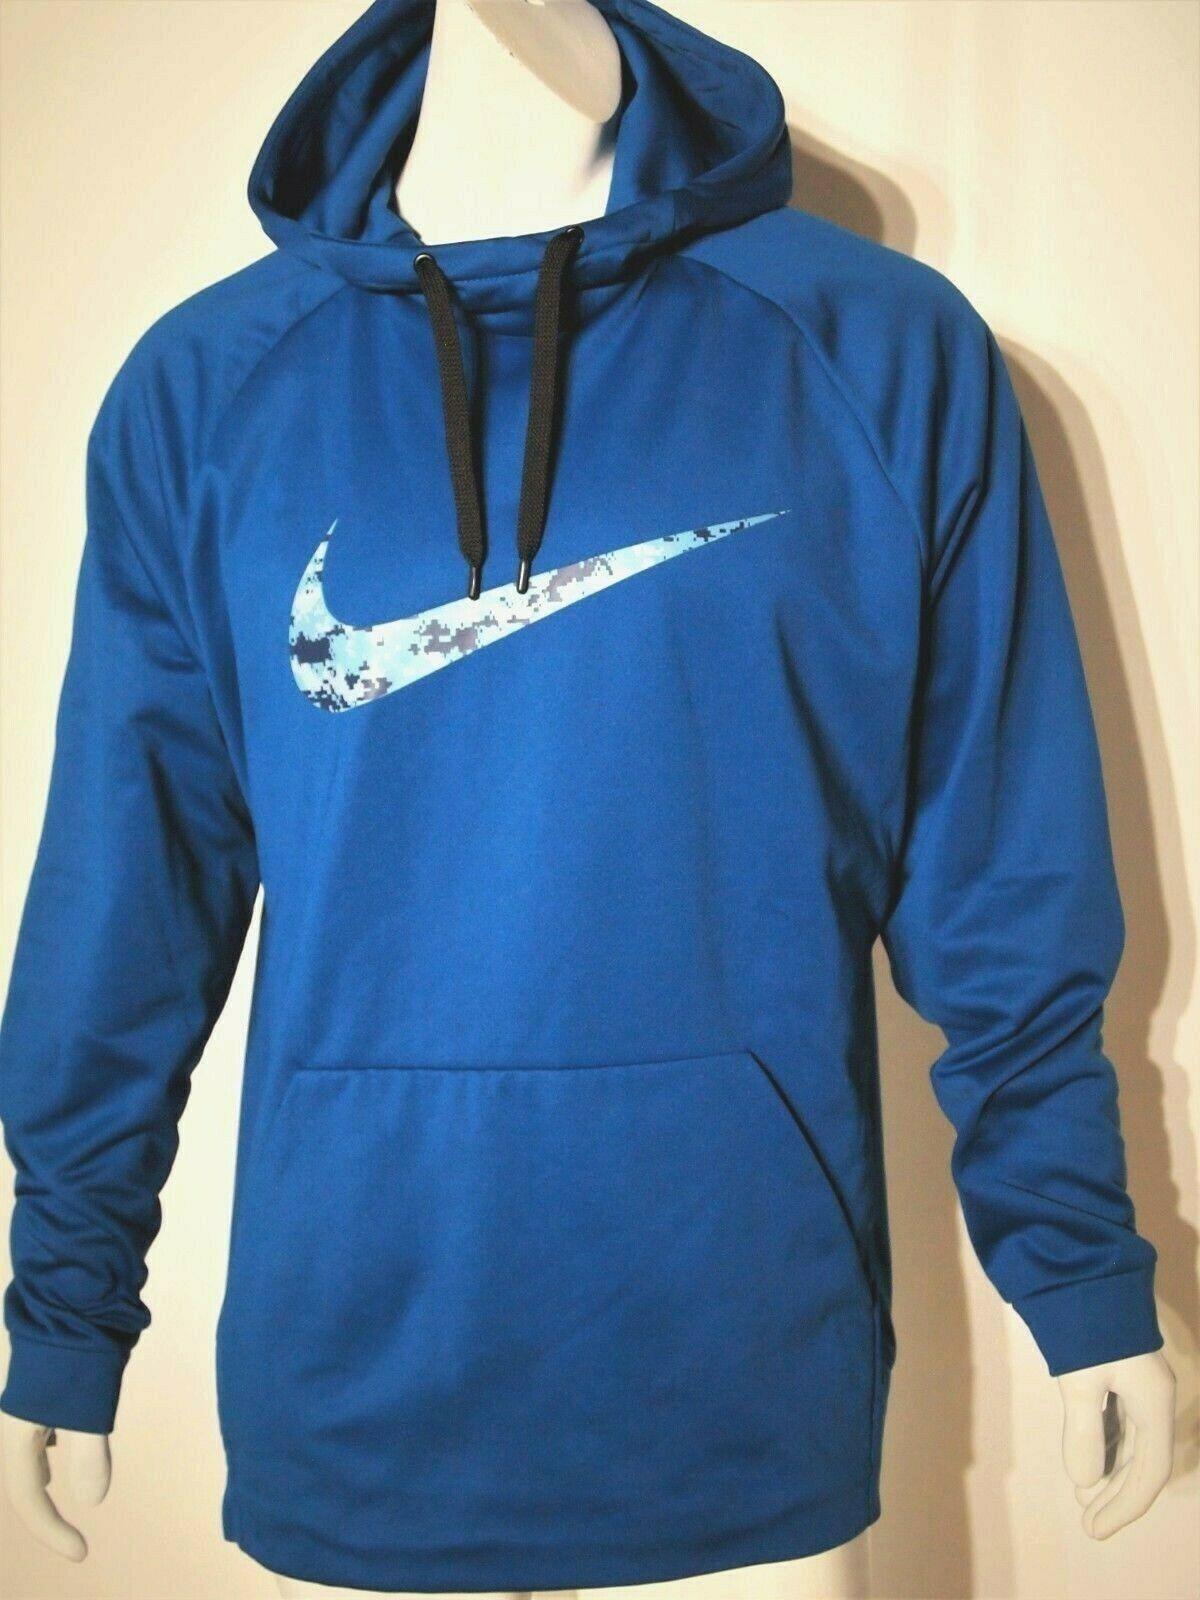 quality design 21eca c8d48 Nike Hoodies Xxl